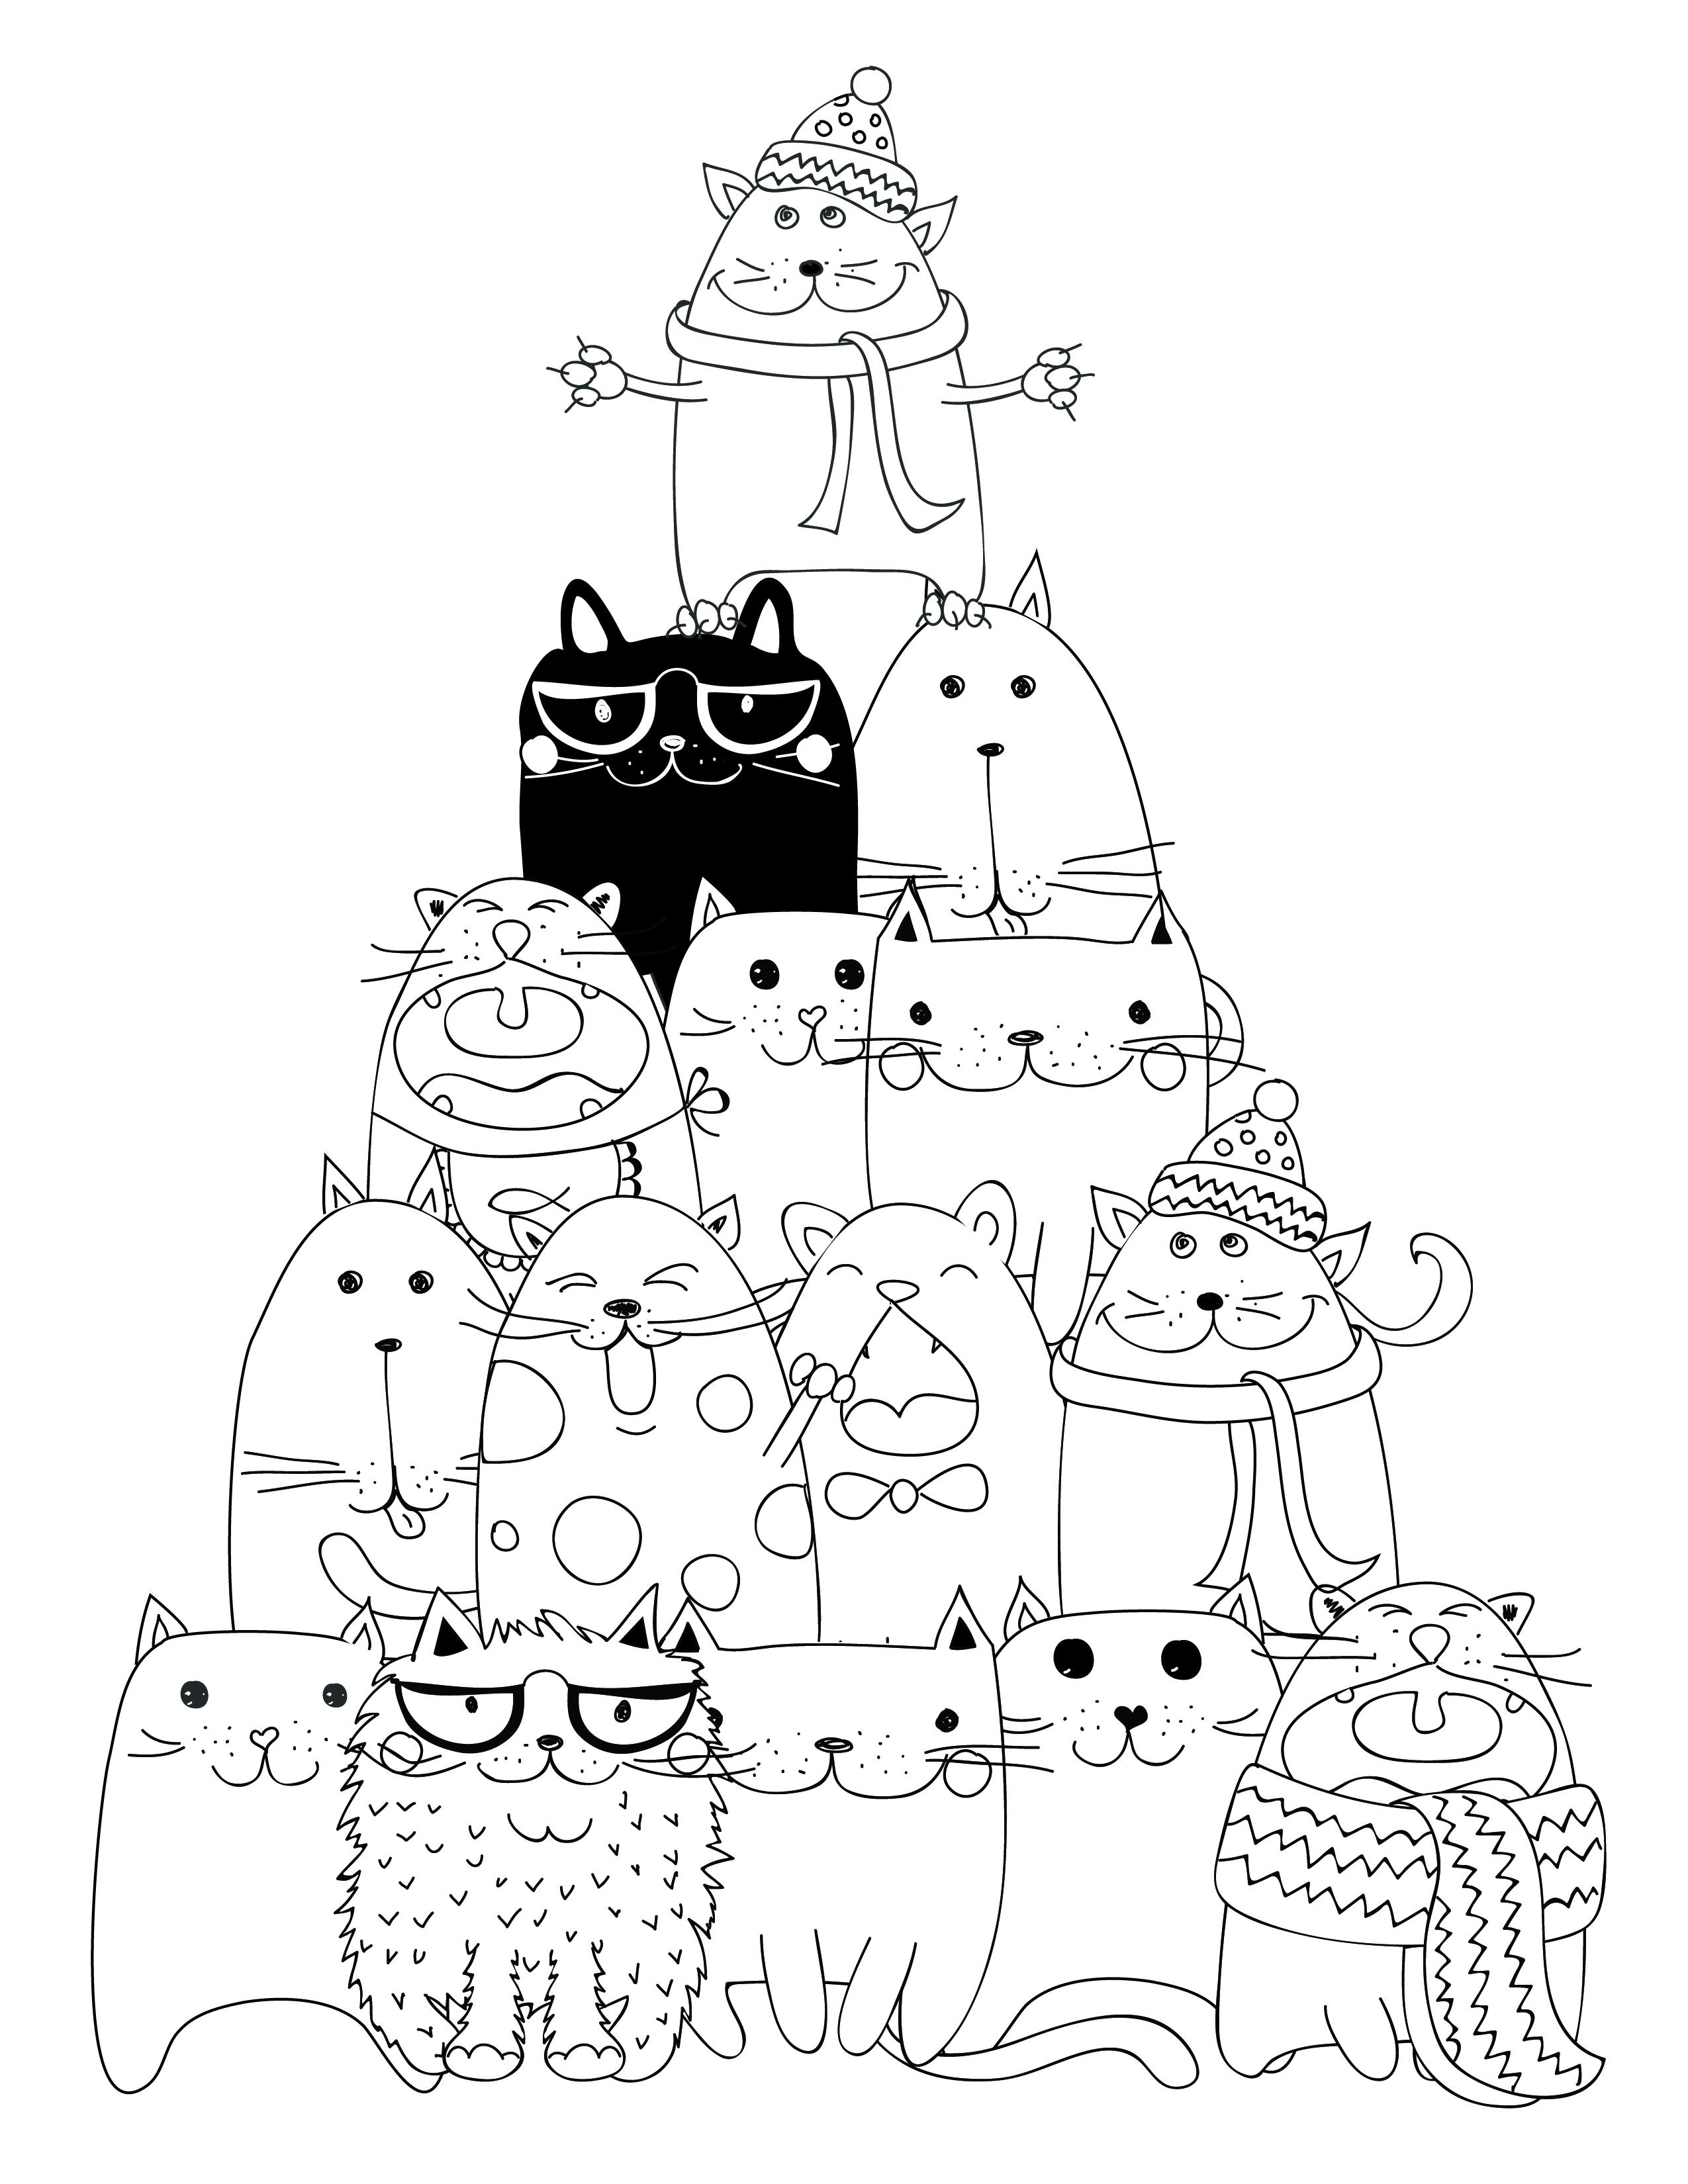 Dessin imprimer pyramide chat coloriage - Dessin de chat kawaii ...